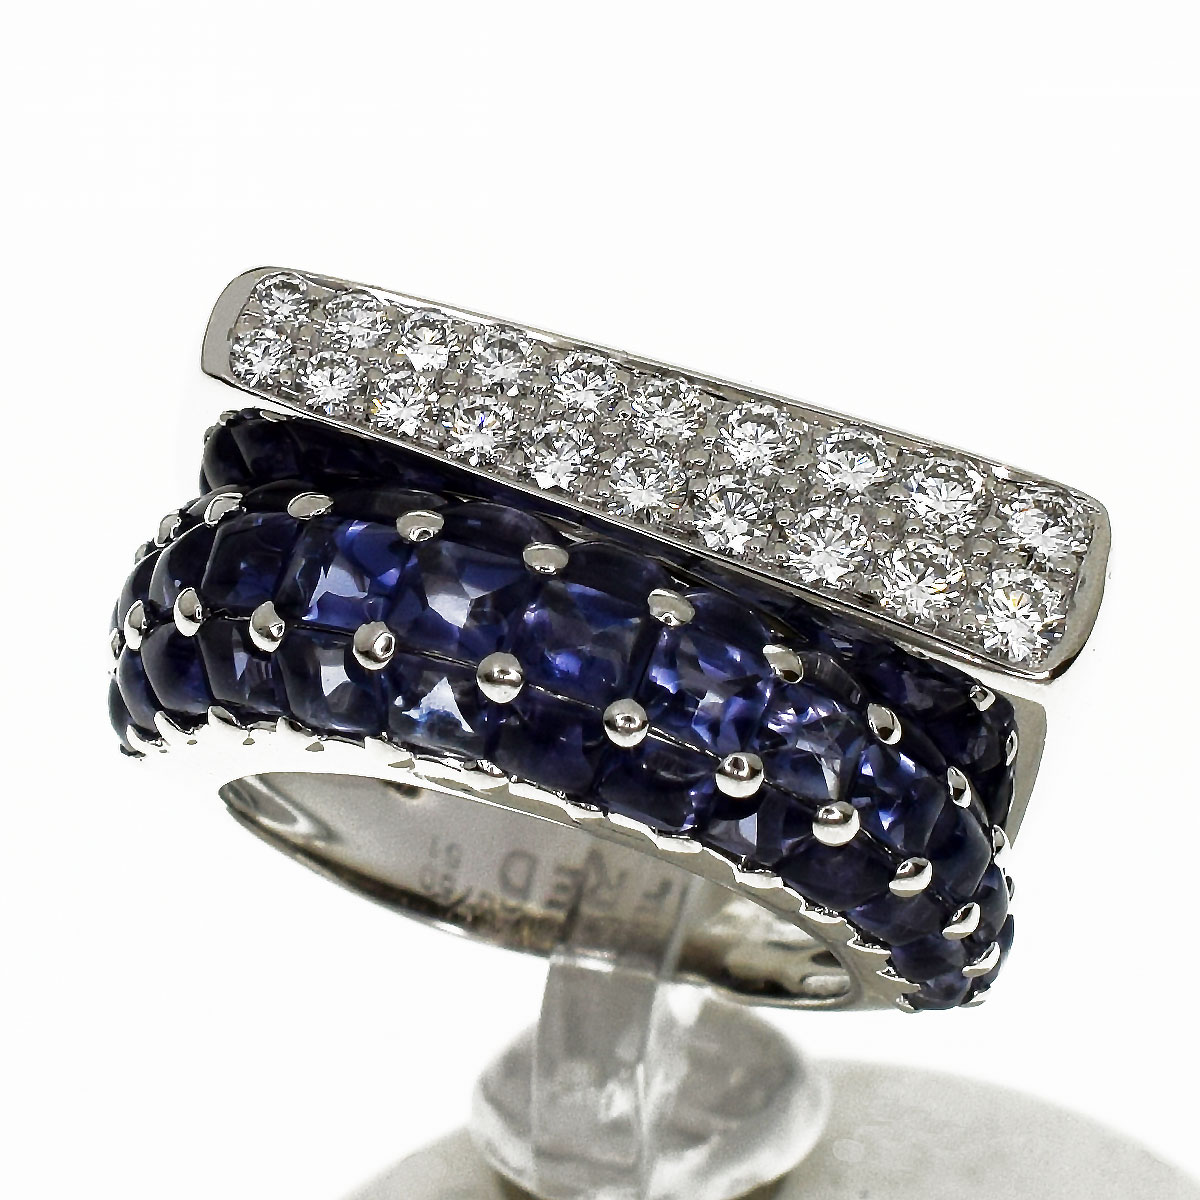 FRED フレッド サクセス ダイヤ アイオライト リング ミディアムモデル K18 750 WG ホワイトゴールド 日本サイズ約11号 #51【送料無料】【代引き手数料無料】レディース 指輪【中古】31420606